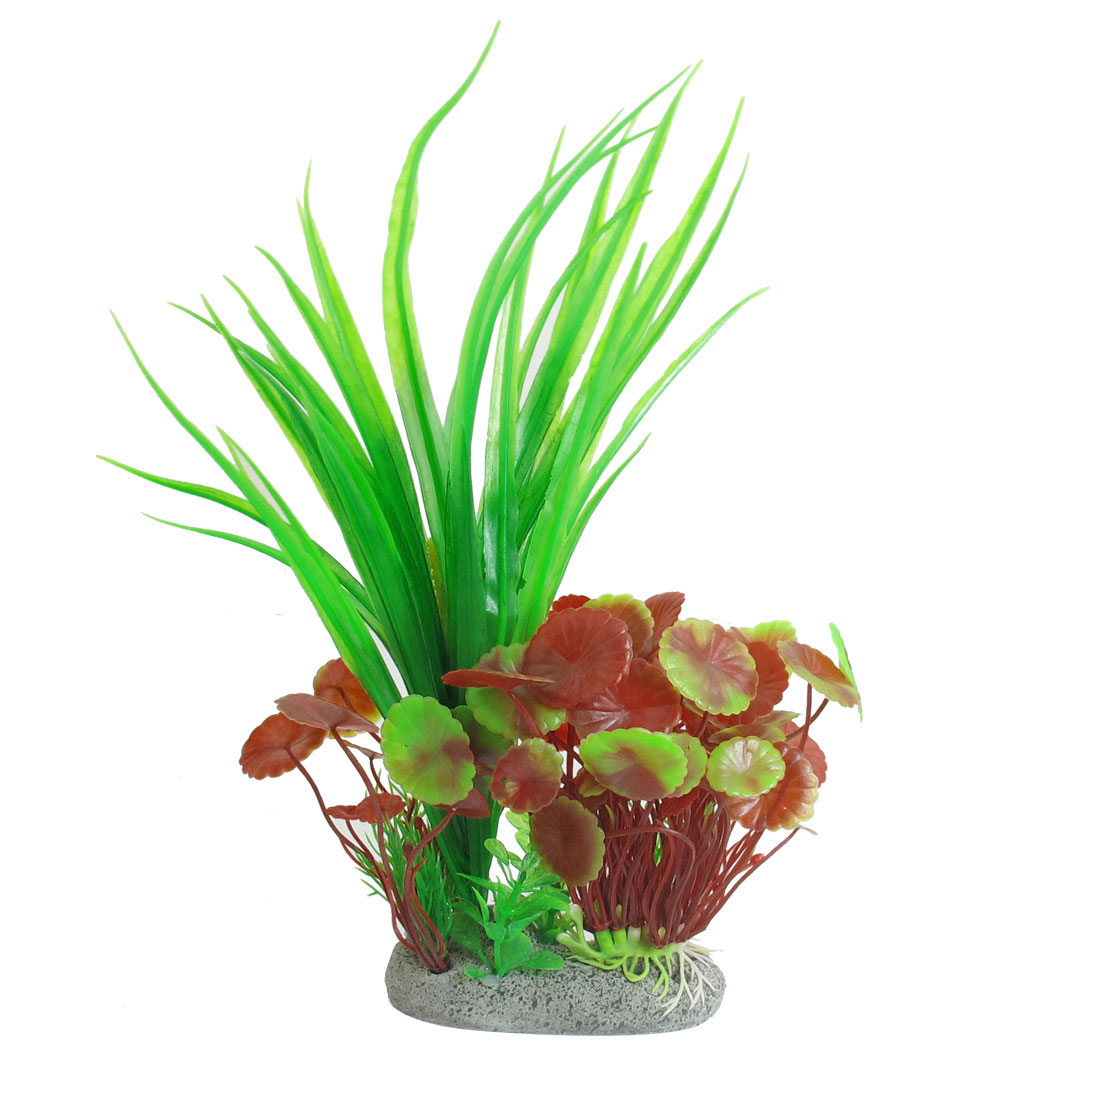 "Aquarium Green Amaranth Manmade Water Grass Plants Decoration 10.8"" Height"